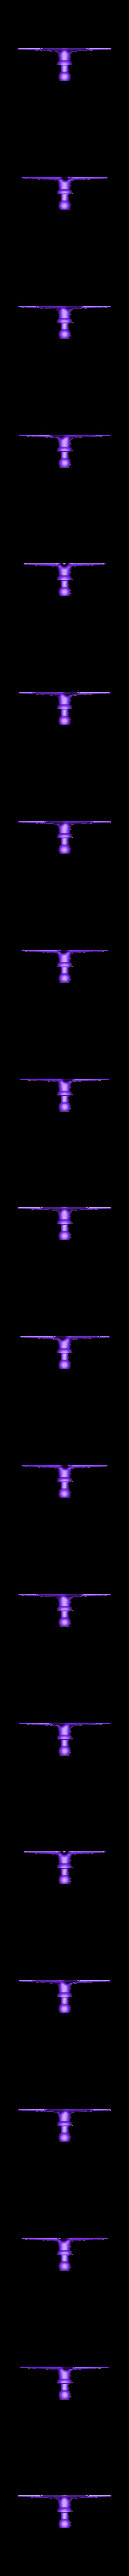 mini_tentacles_solid.STL Download free STL file Mini Tentacles • 3D print model, OgoSport